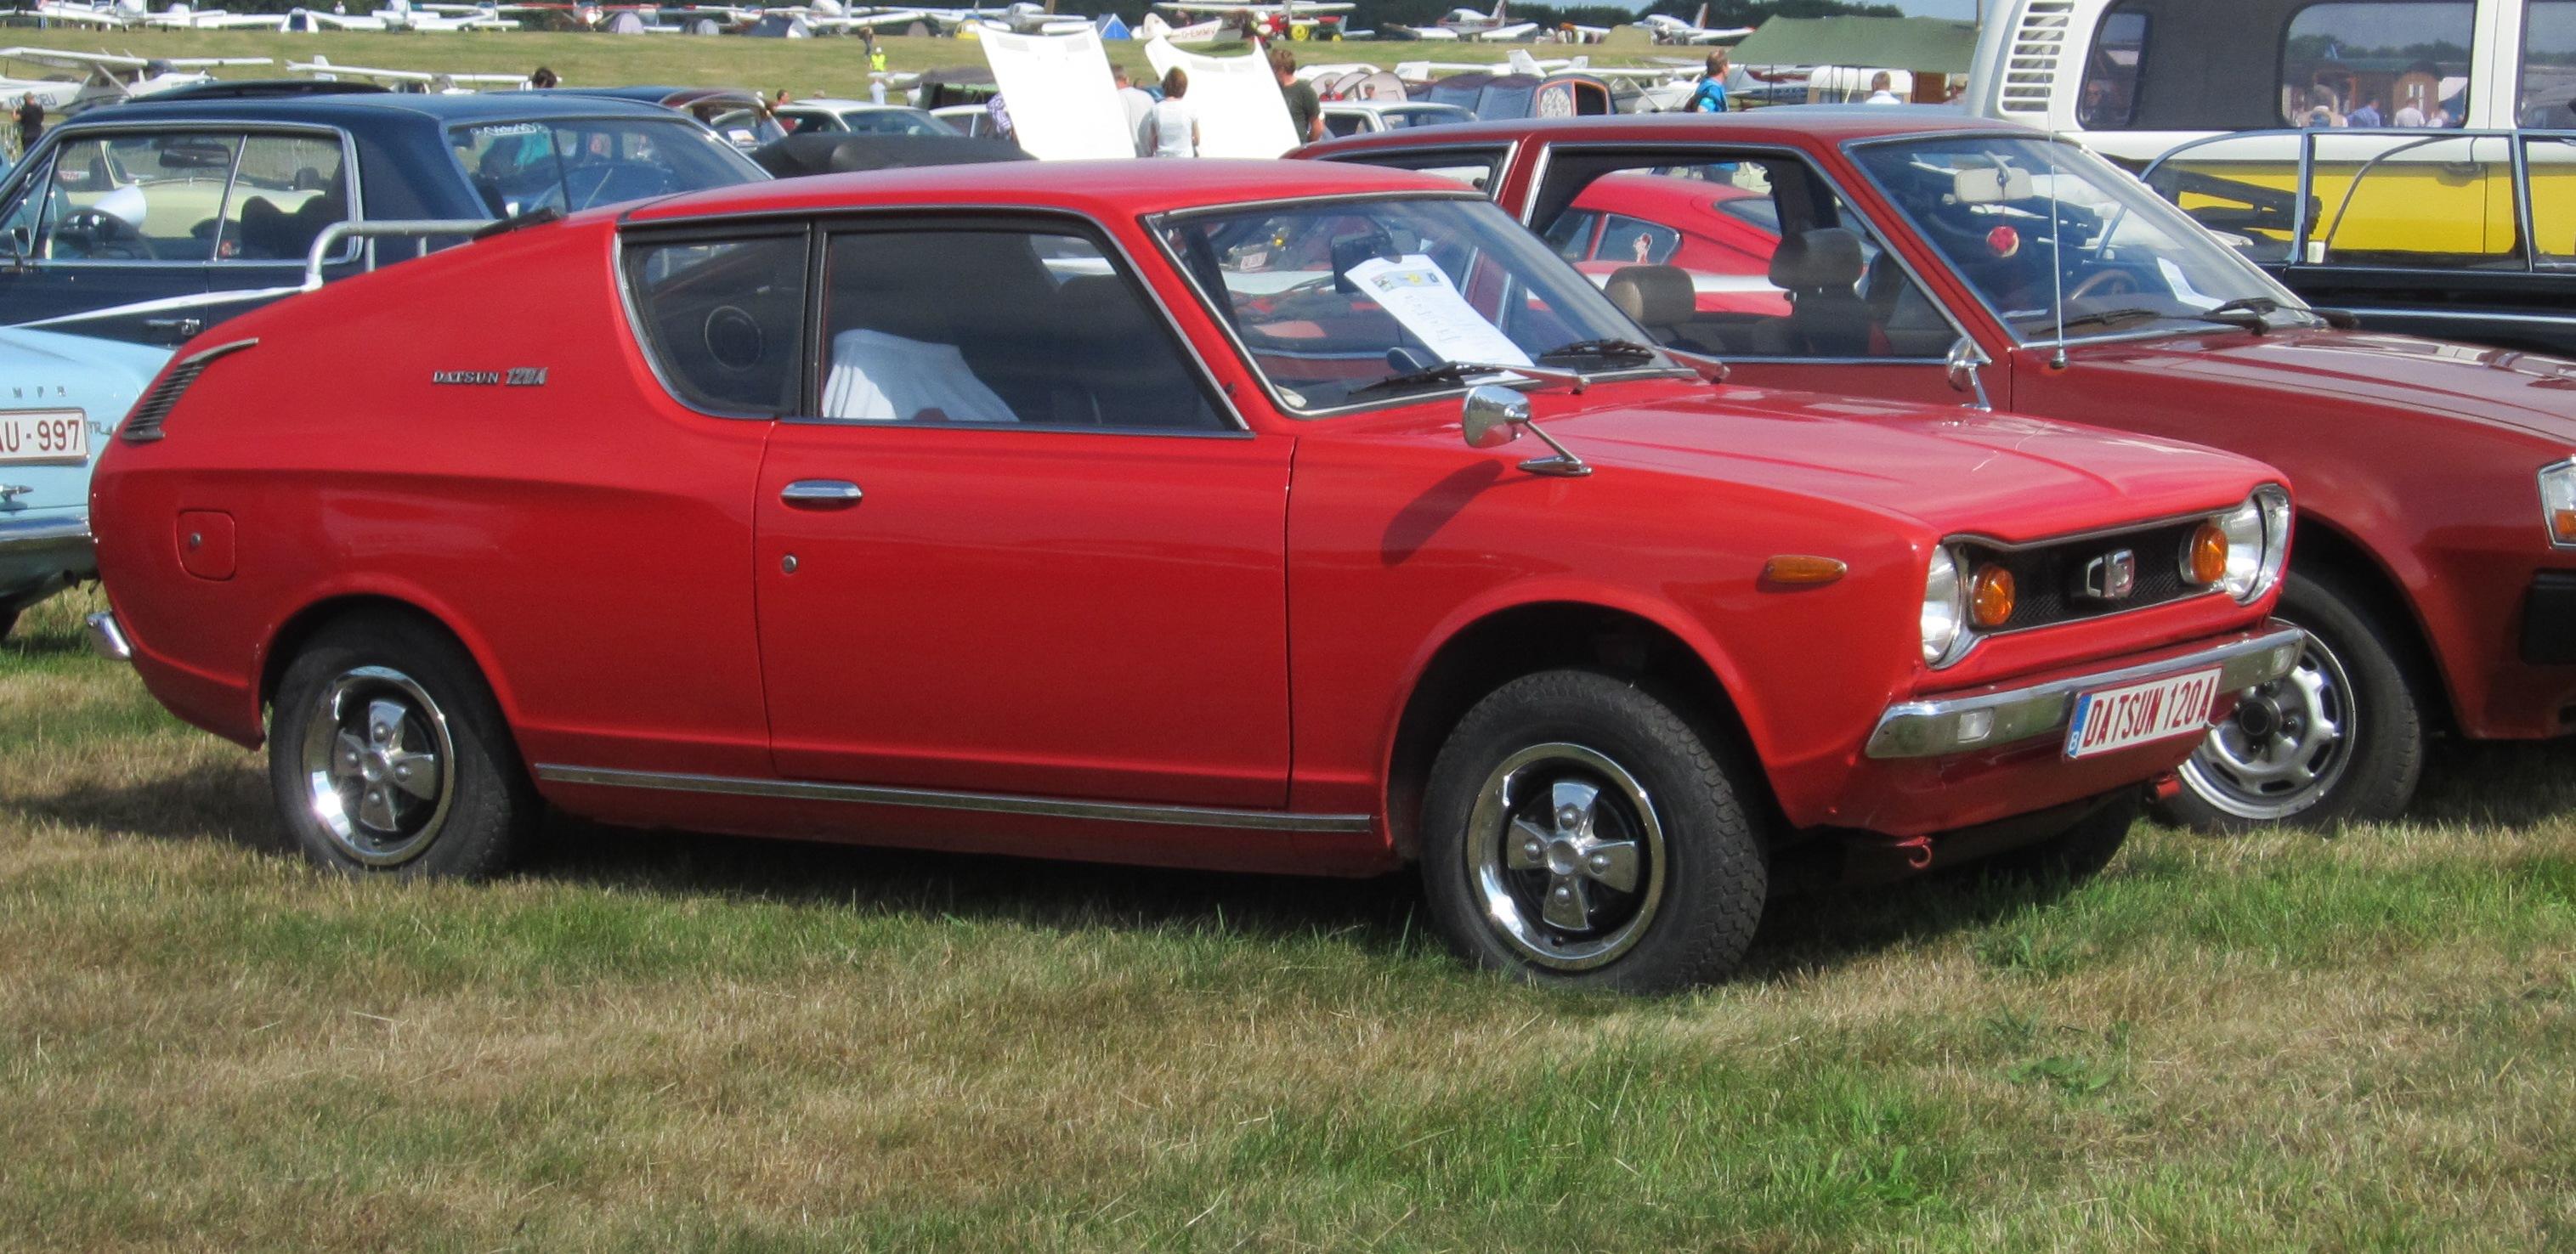 Datsun Cherry I 1970 - 1974 Coupe #4